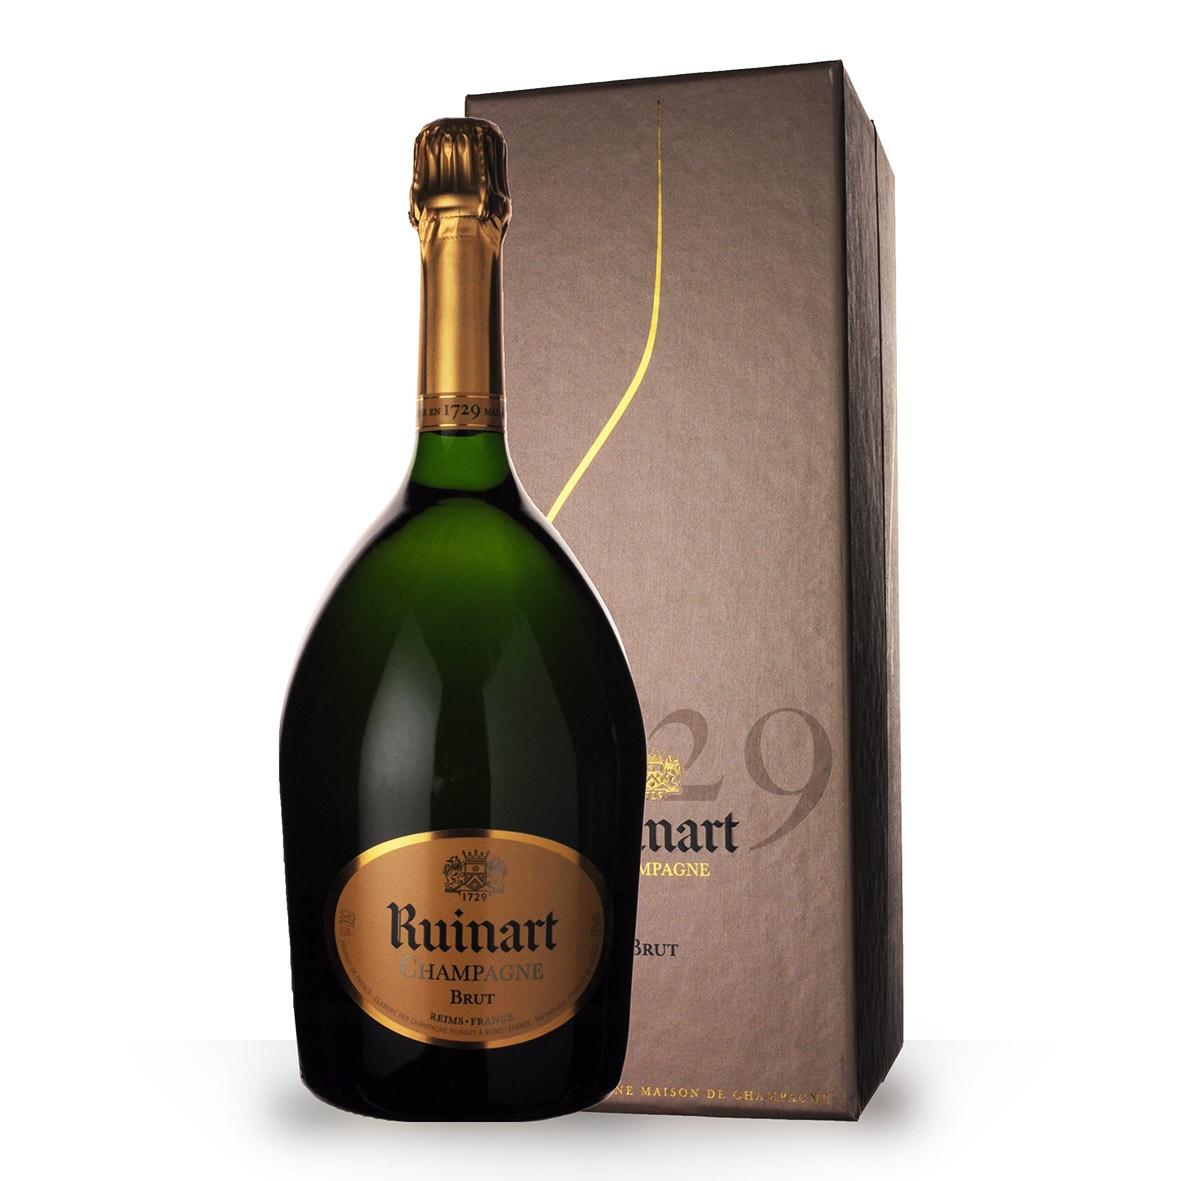 Champagne R de Ruinart Brut 150cl Coffret www.odyssee-vins.com